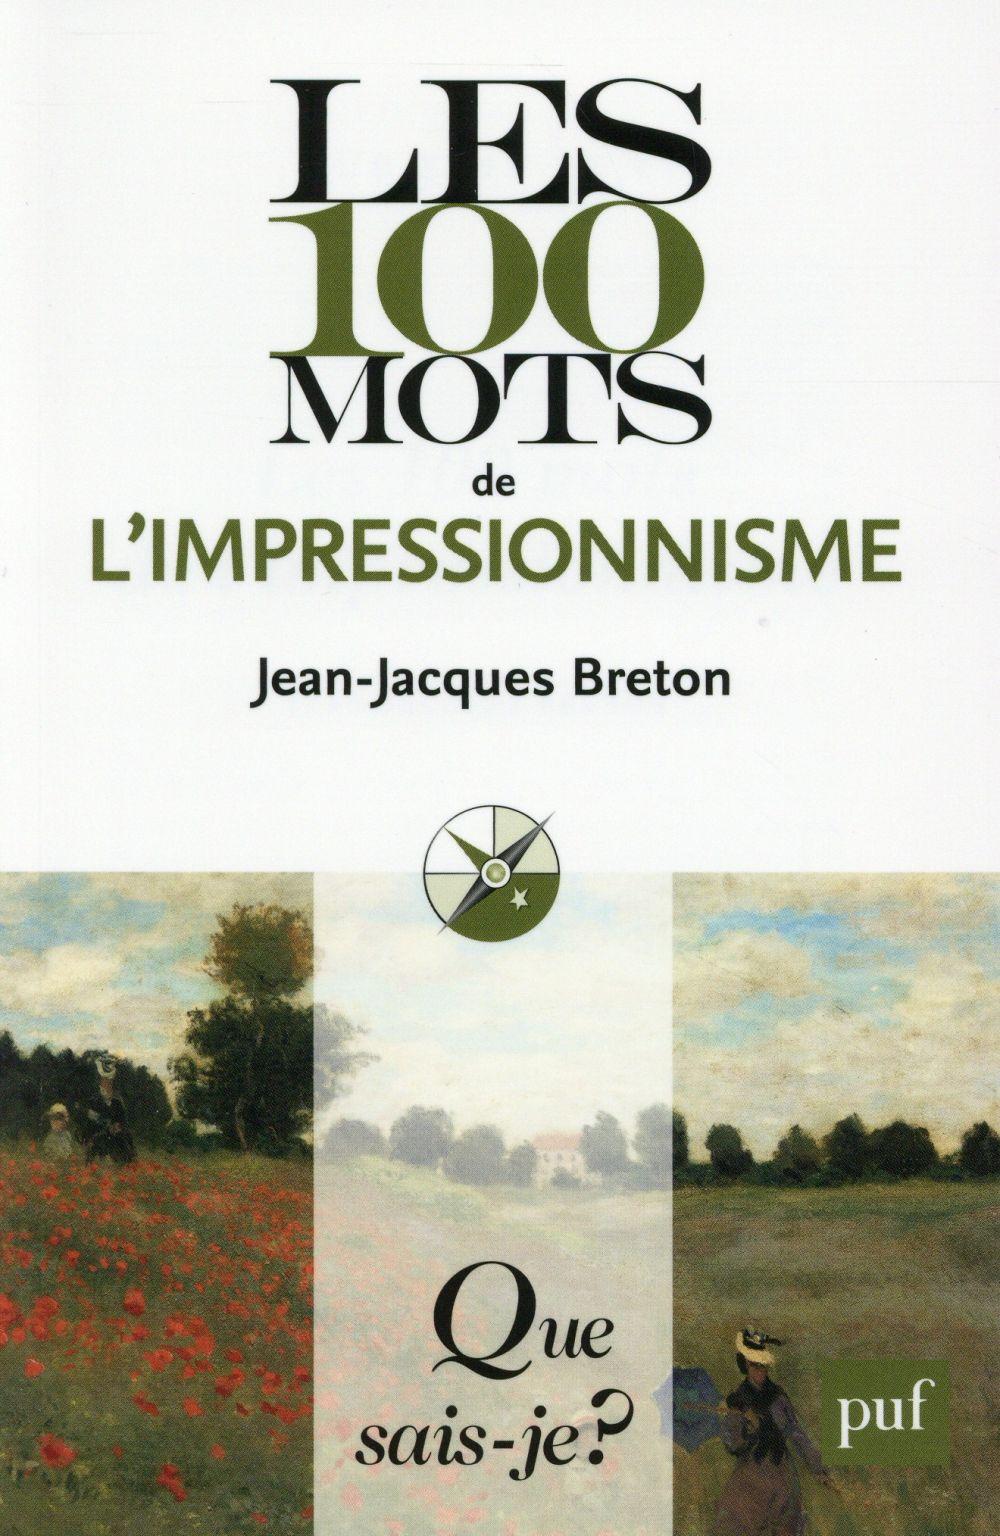 100 MOTS DE L'IMPRESSIONNISME QSJ 4028 (LES) BRETON JEAN-JACQUES PUF